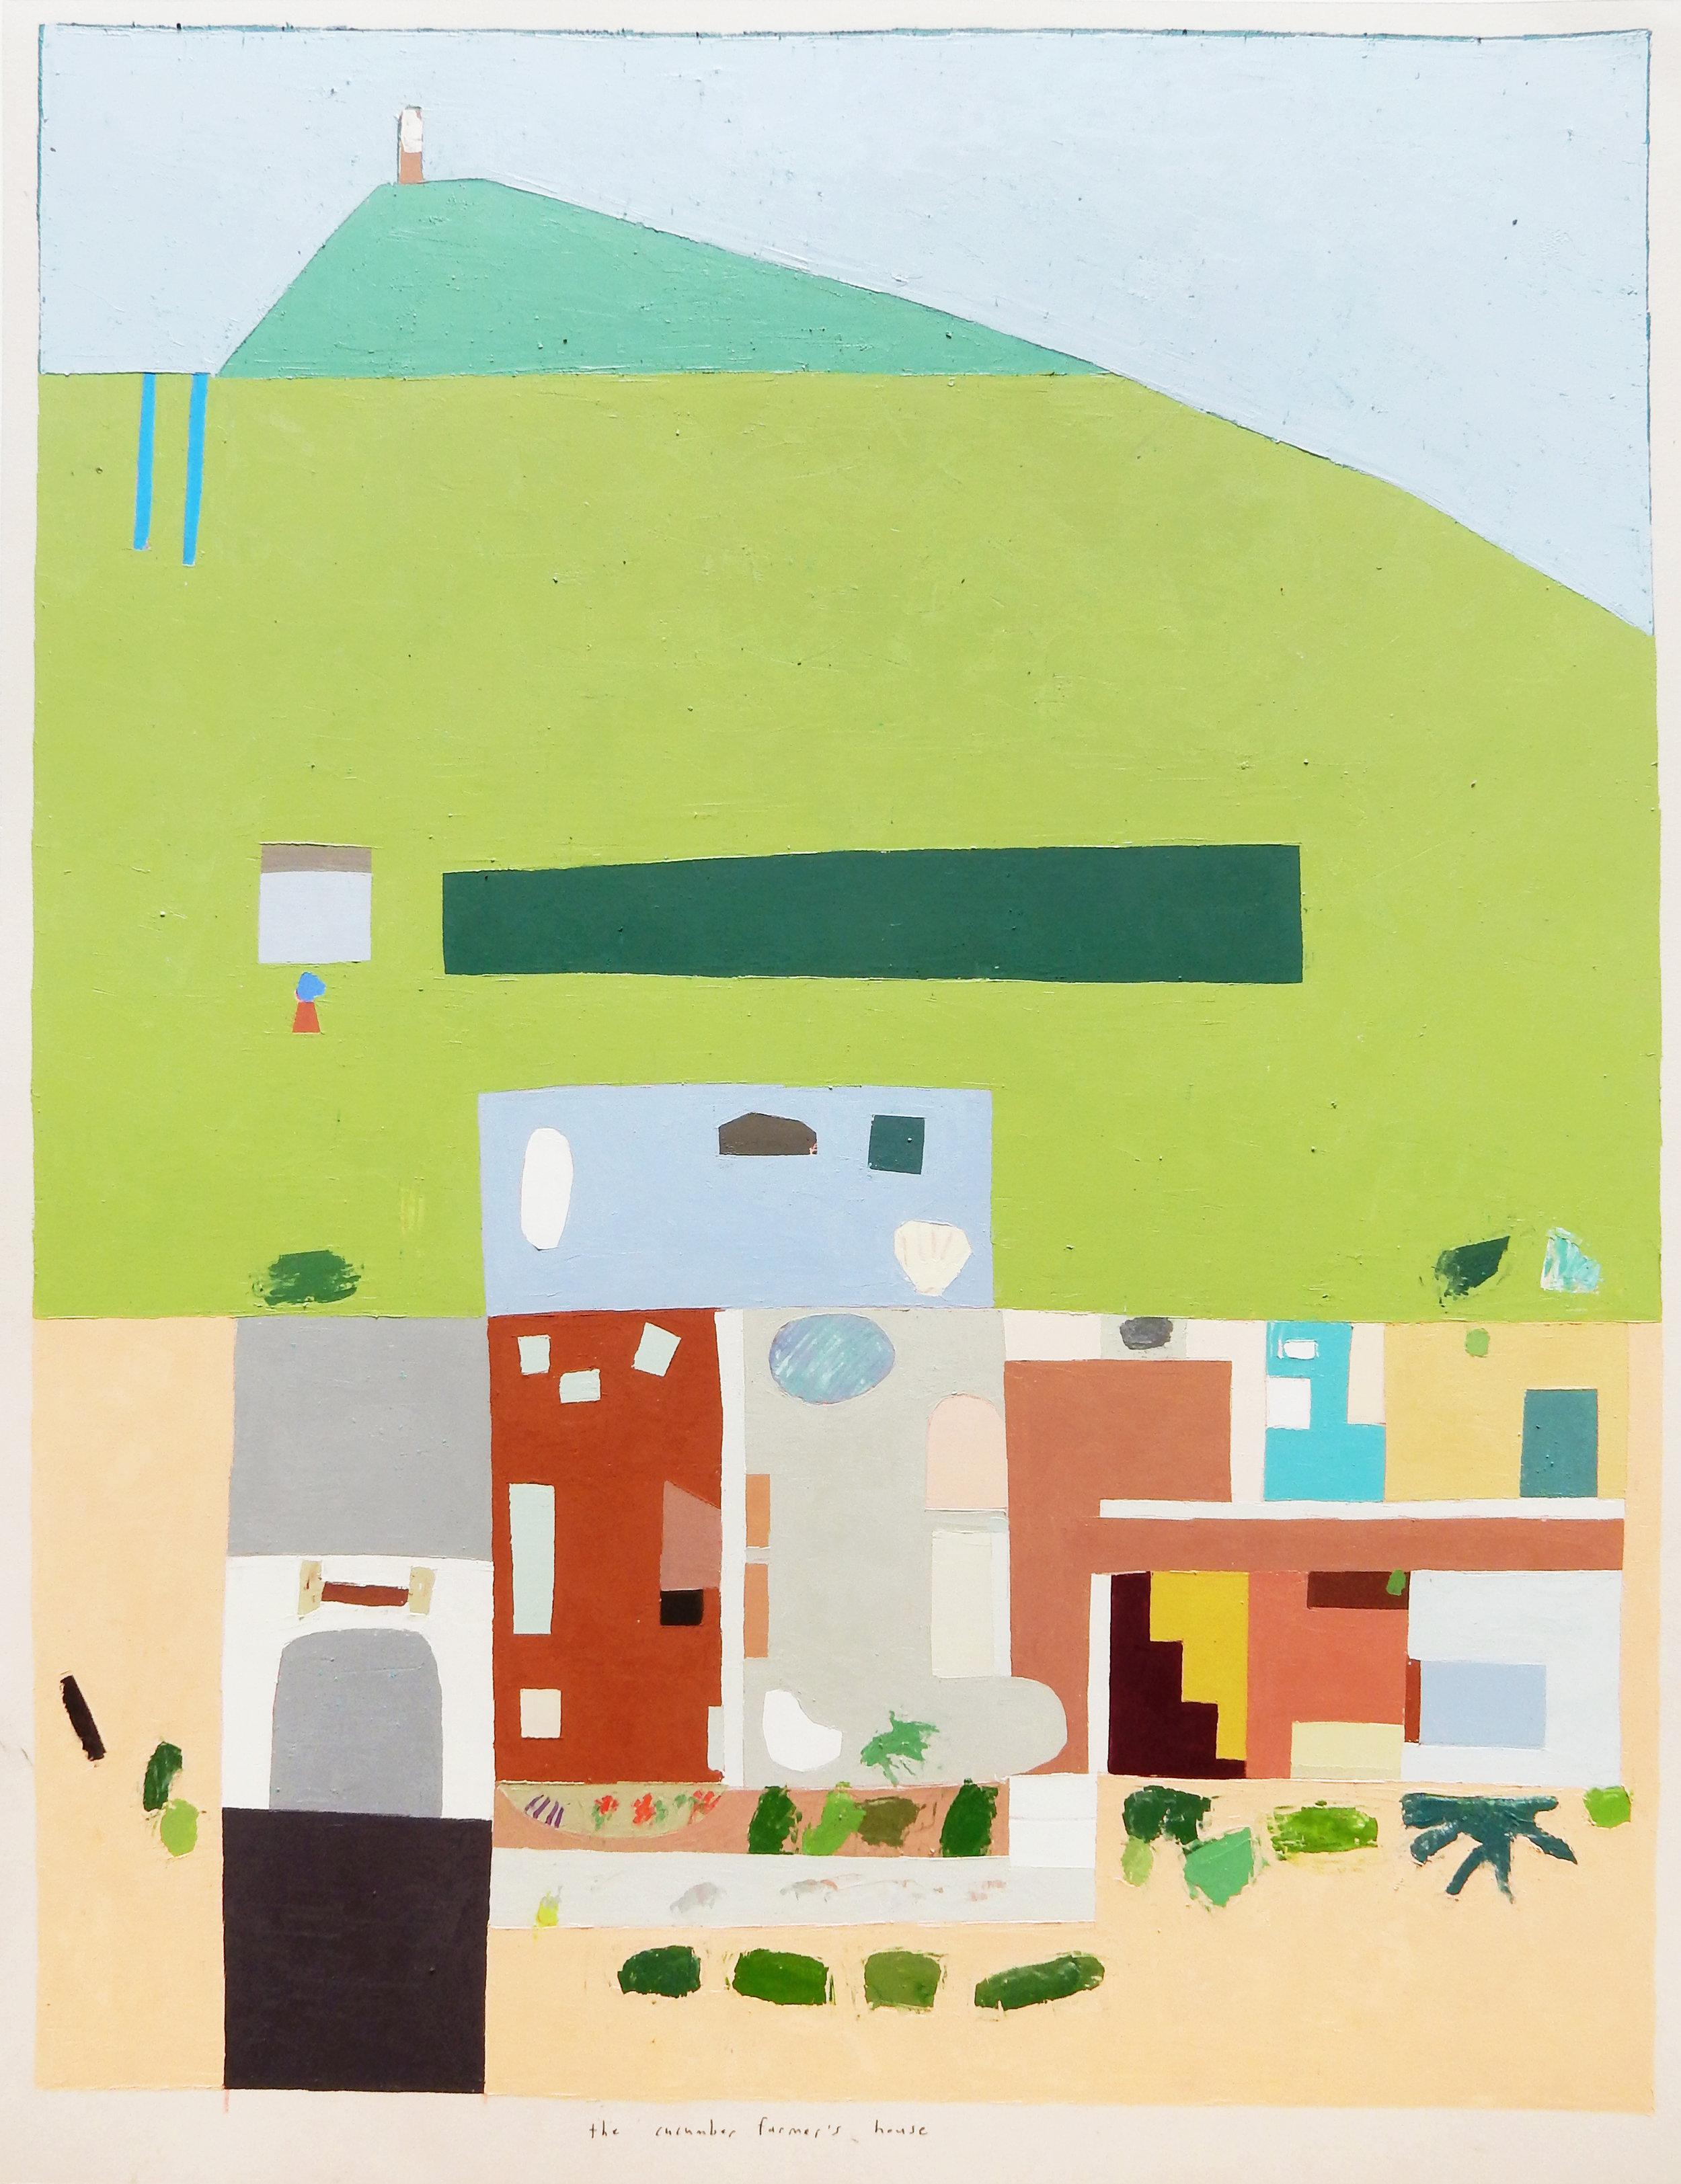 01_the cucumber farmer's house_24 x 18 in_oil on paper_2016.jpg